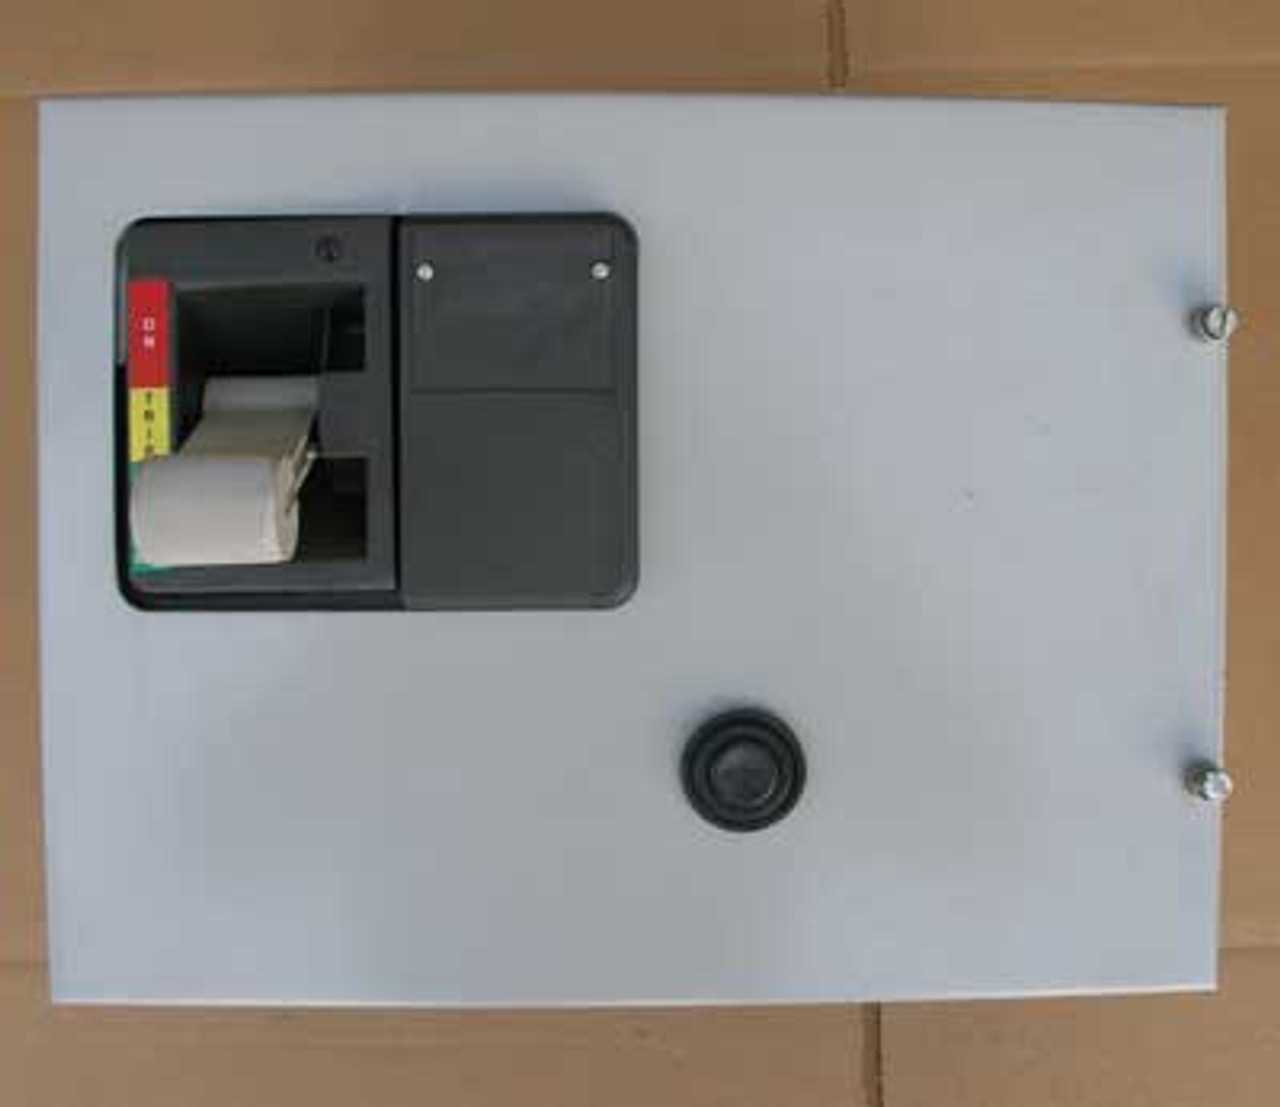 Cutler Hammer 2100 Size 1 MCC Starter Bucket w/ 3 Amp Circuit Breaker - Used